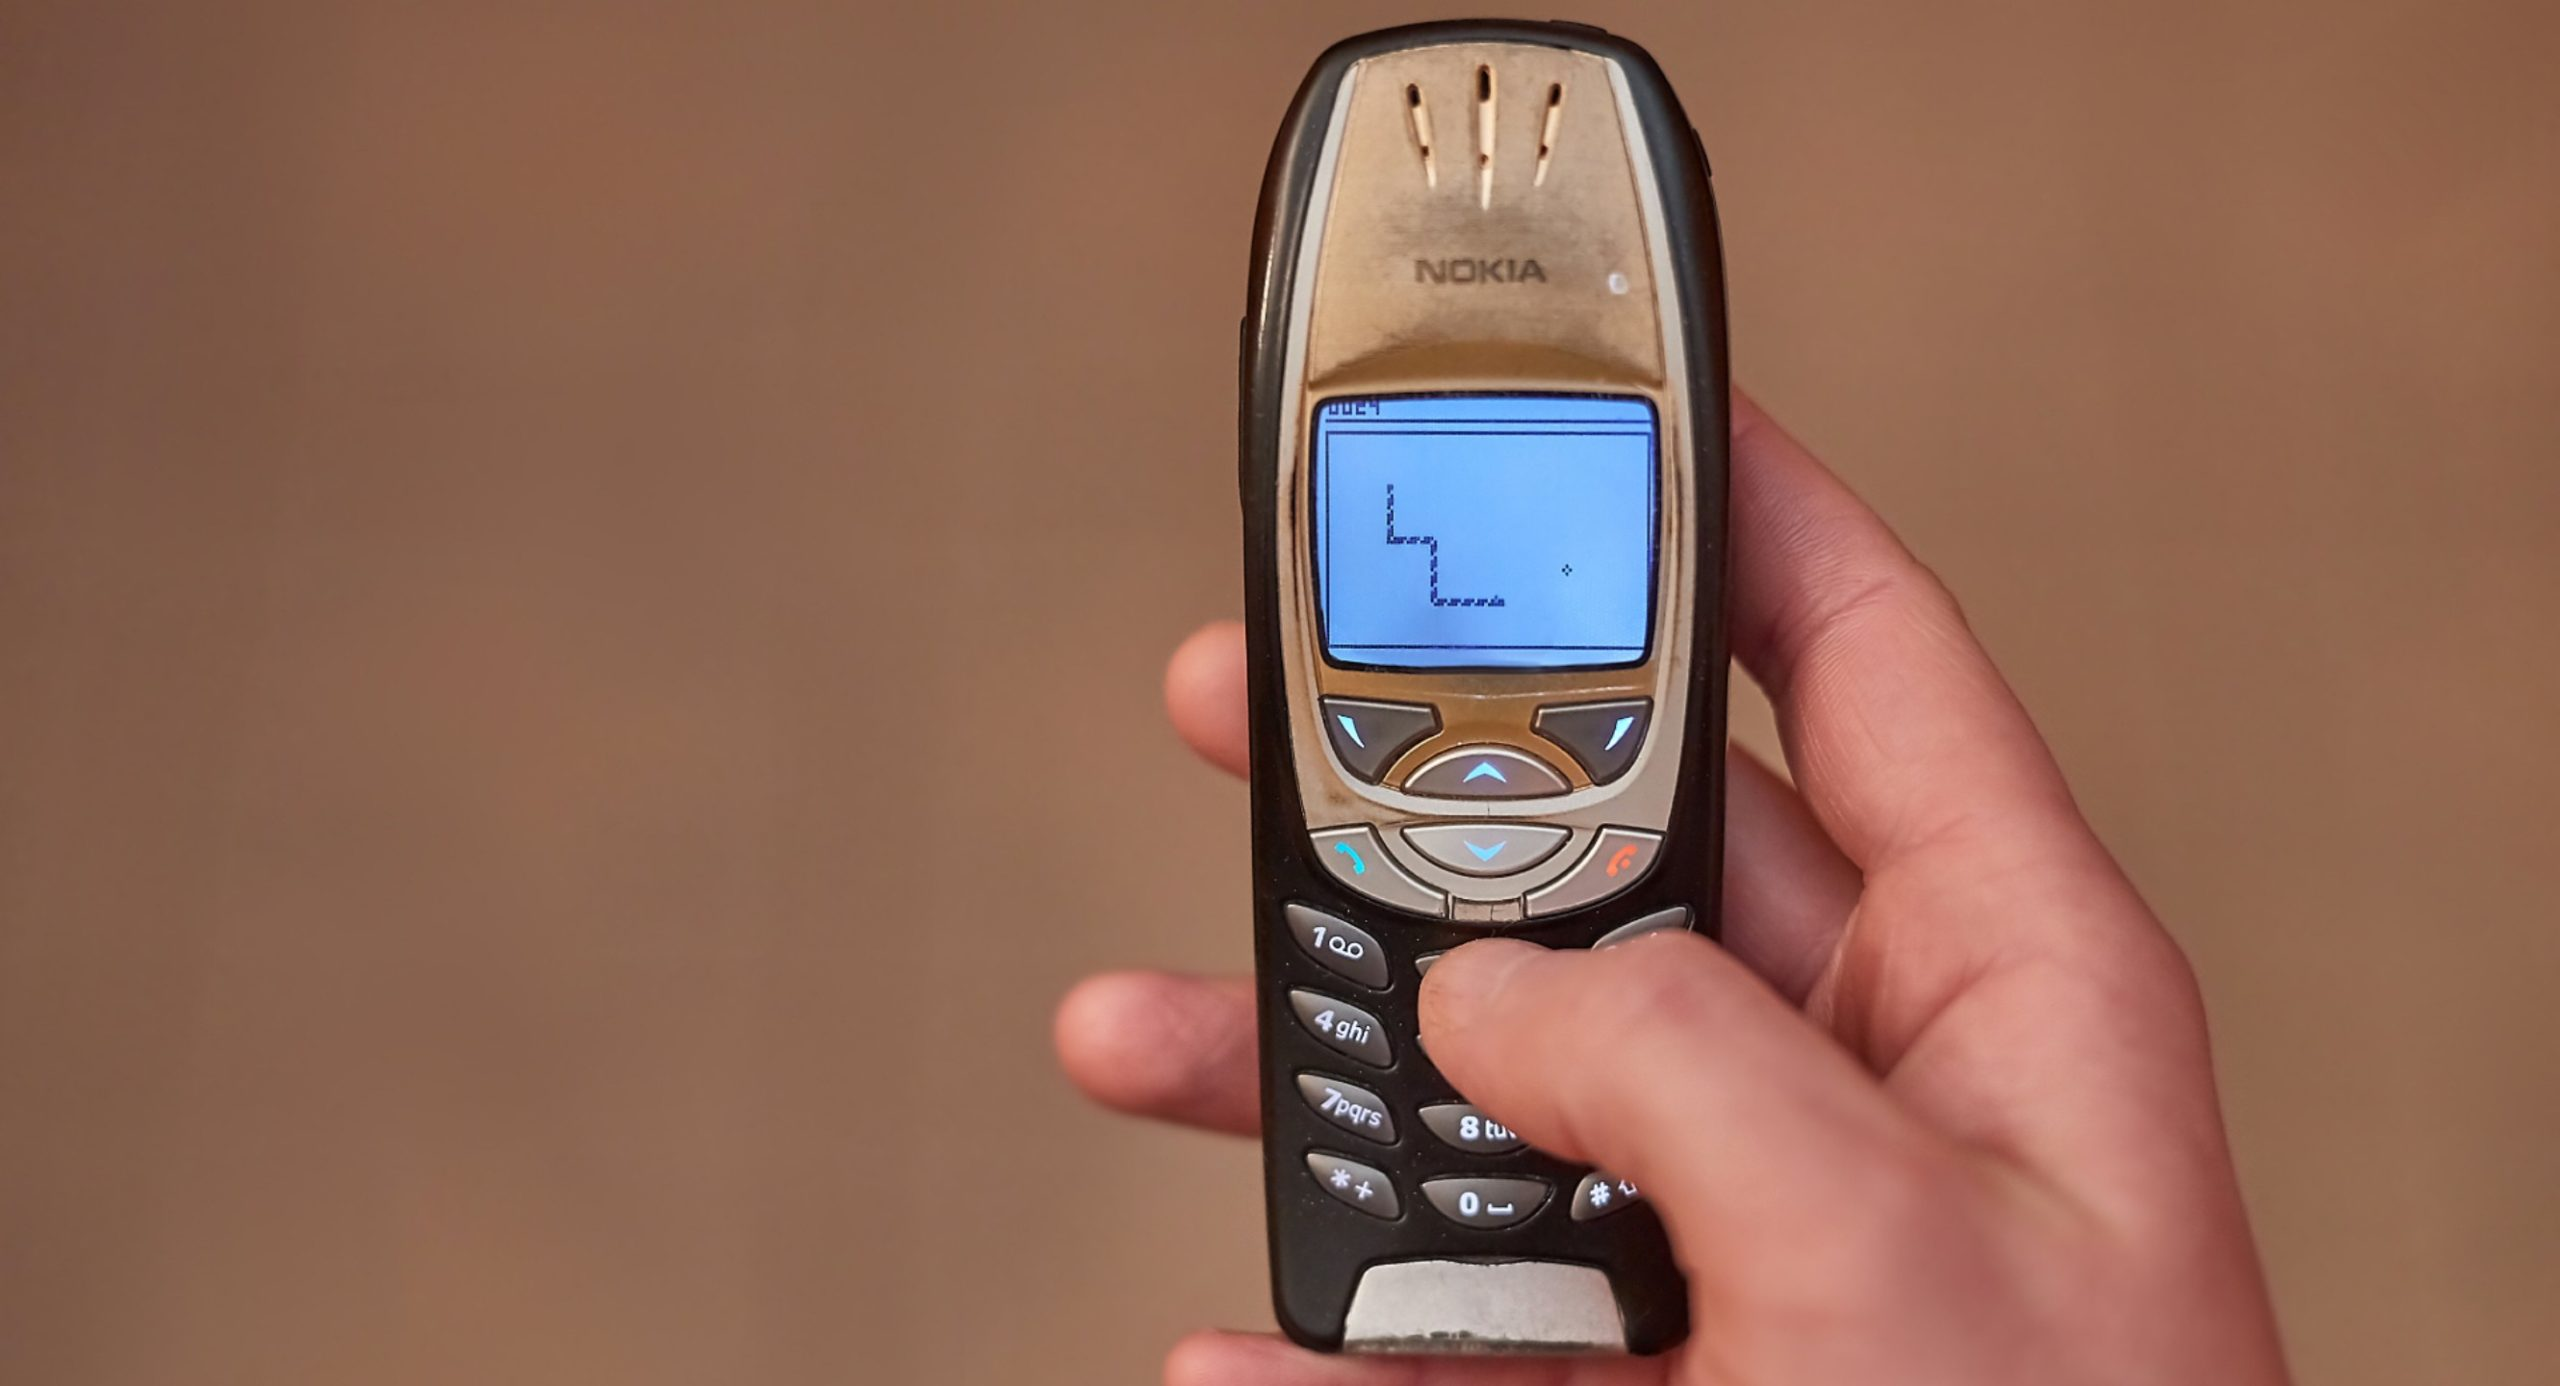 Nokia Brick Phone Re-release